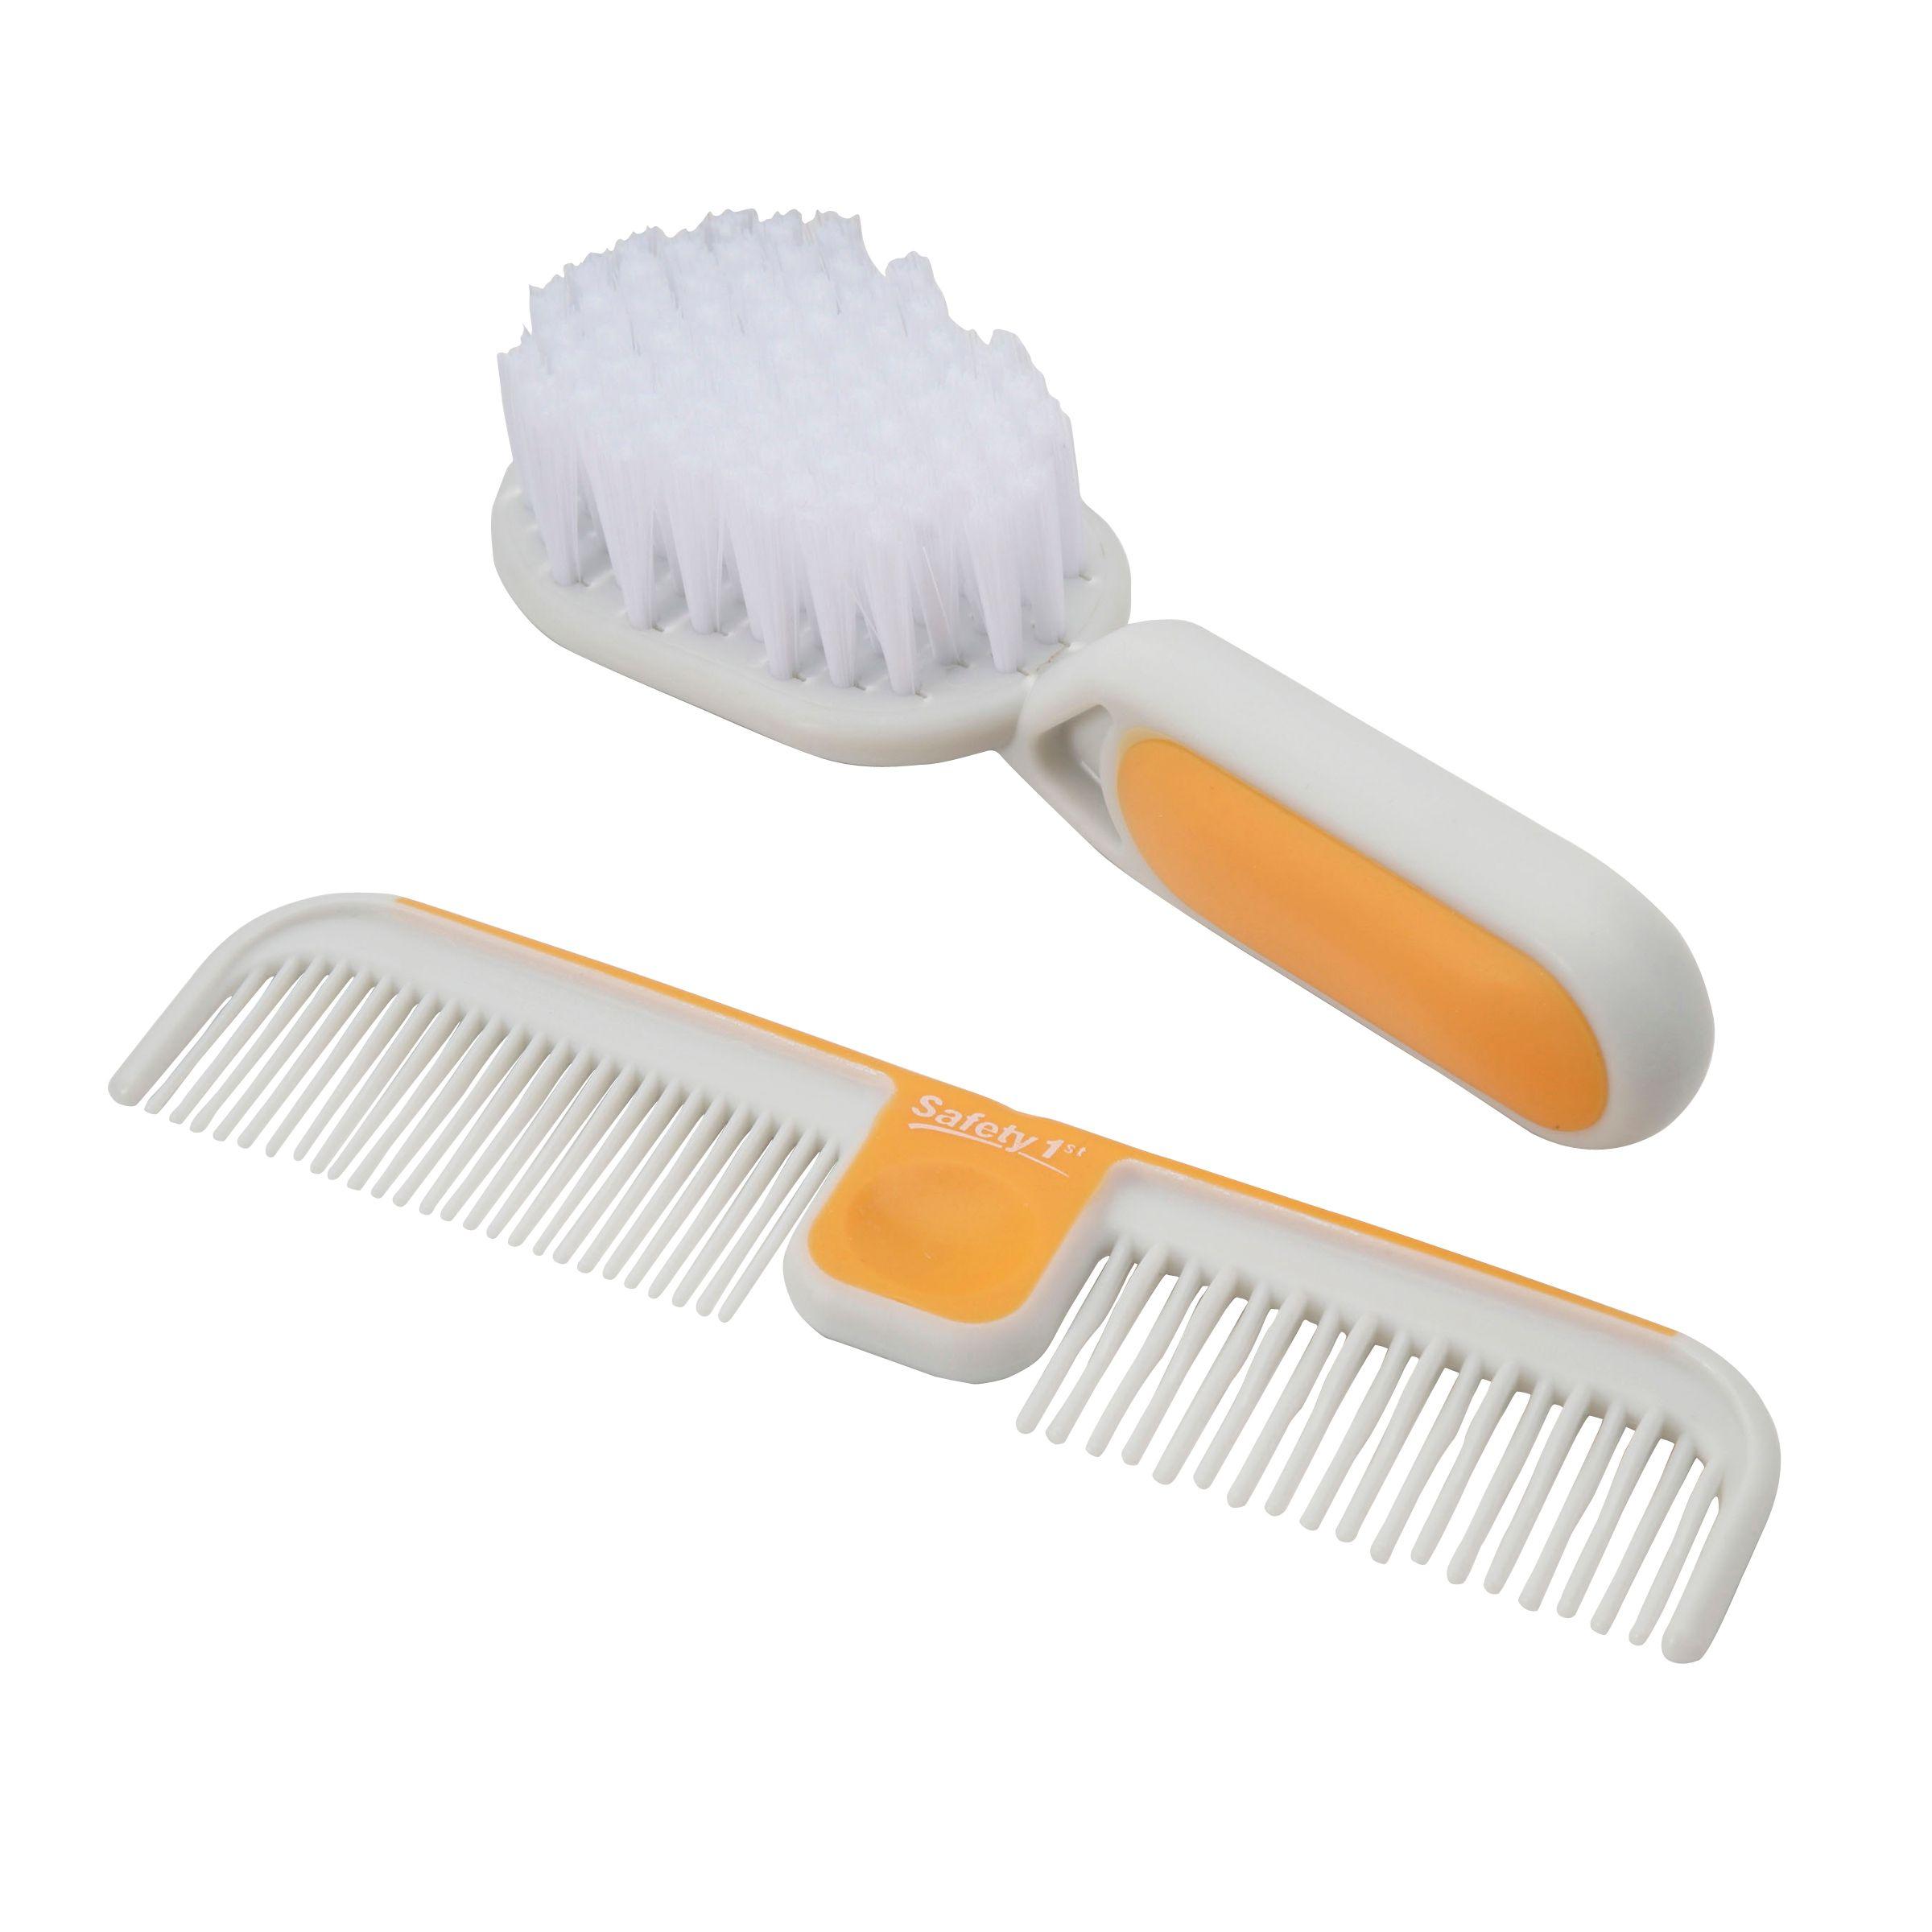 Safety 1st Gentle Care Hair Brush & Comb Set PartNumber: 024W221218110001P KsnValue: 024W221218110001 MfgPartNumber: 49524